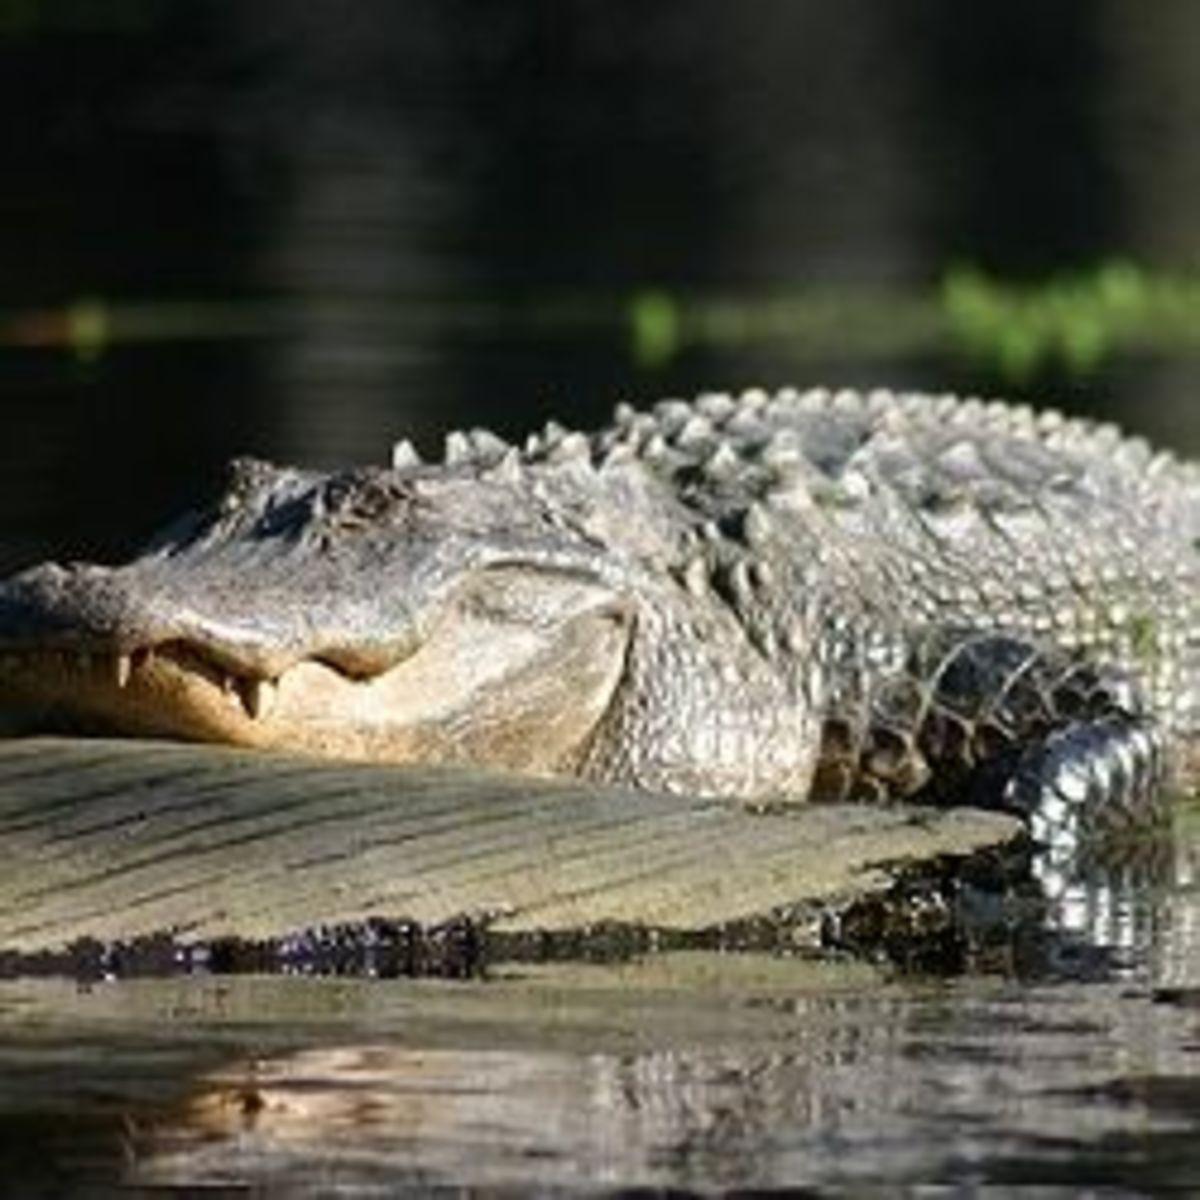 Alligator in a Swamp